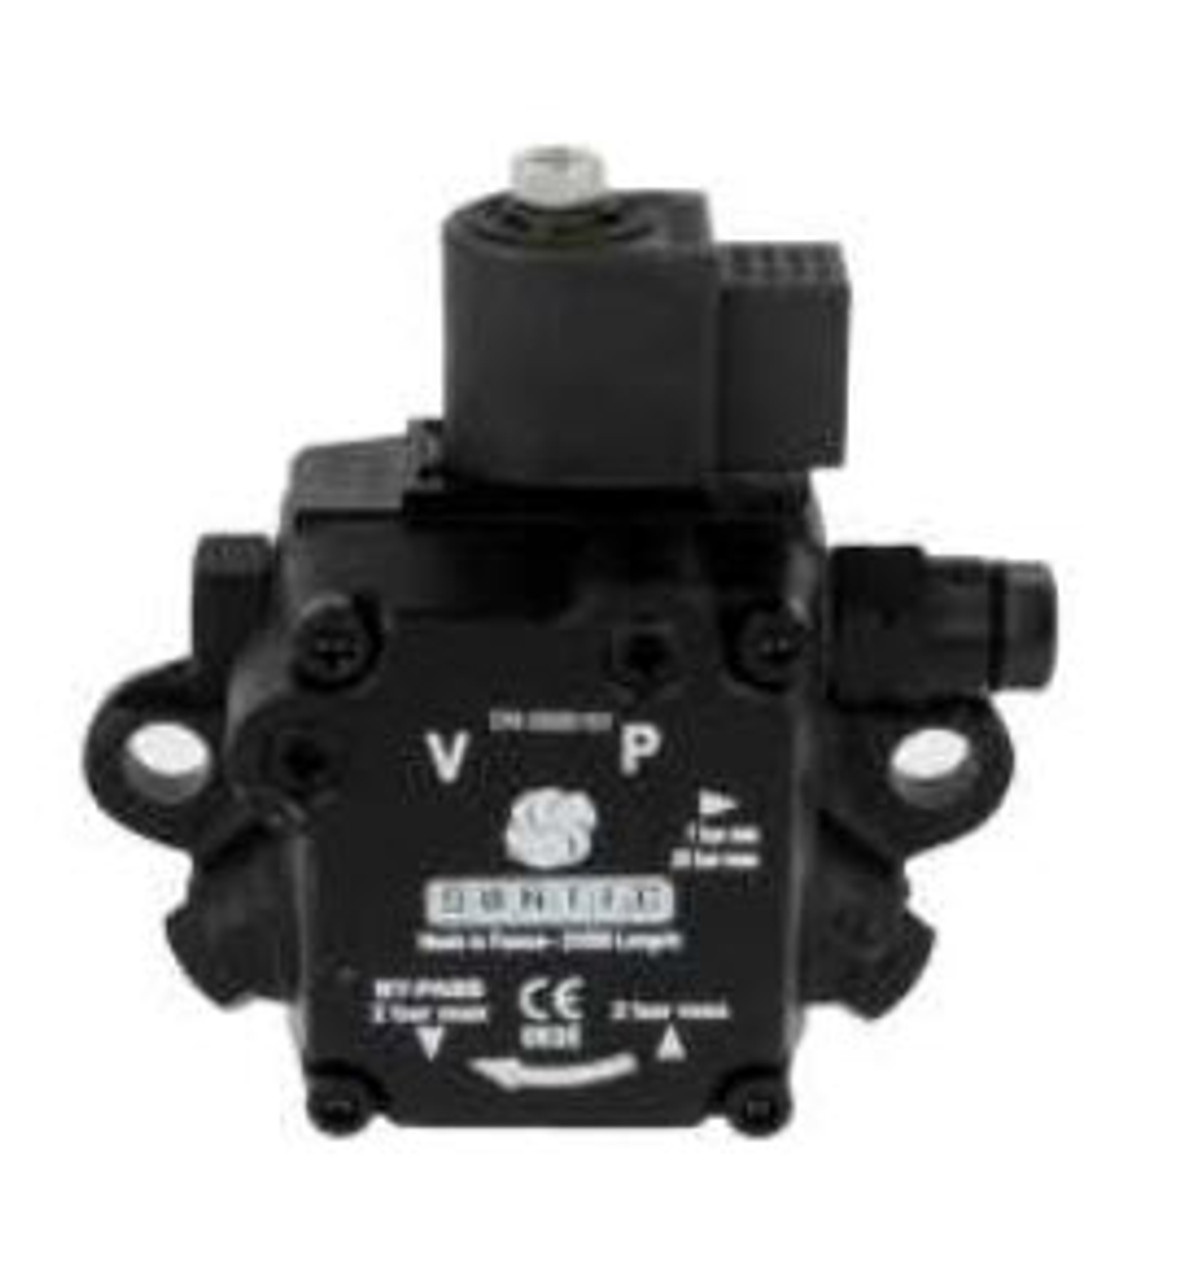 Suntec oil pump AS 47 C 7434 4P 0500